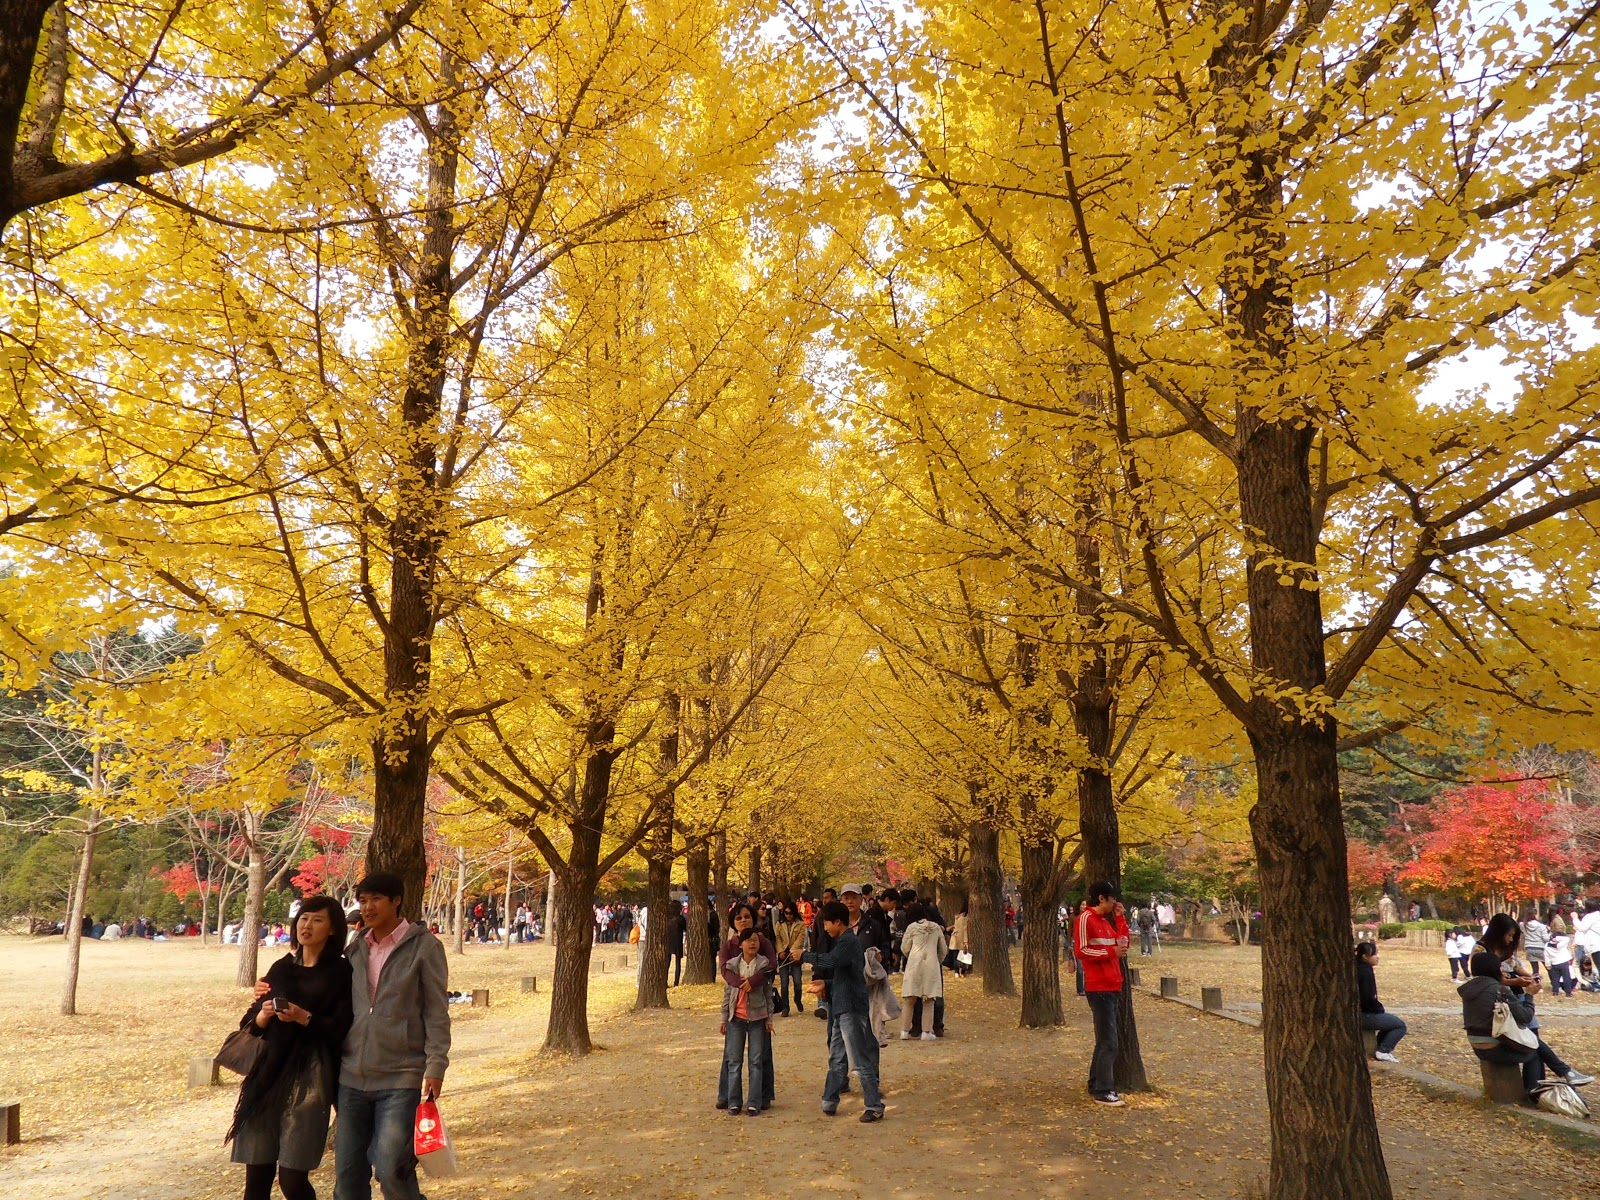 Country Fall Wallpaper Top World Travel Destinations Nami Island Korea